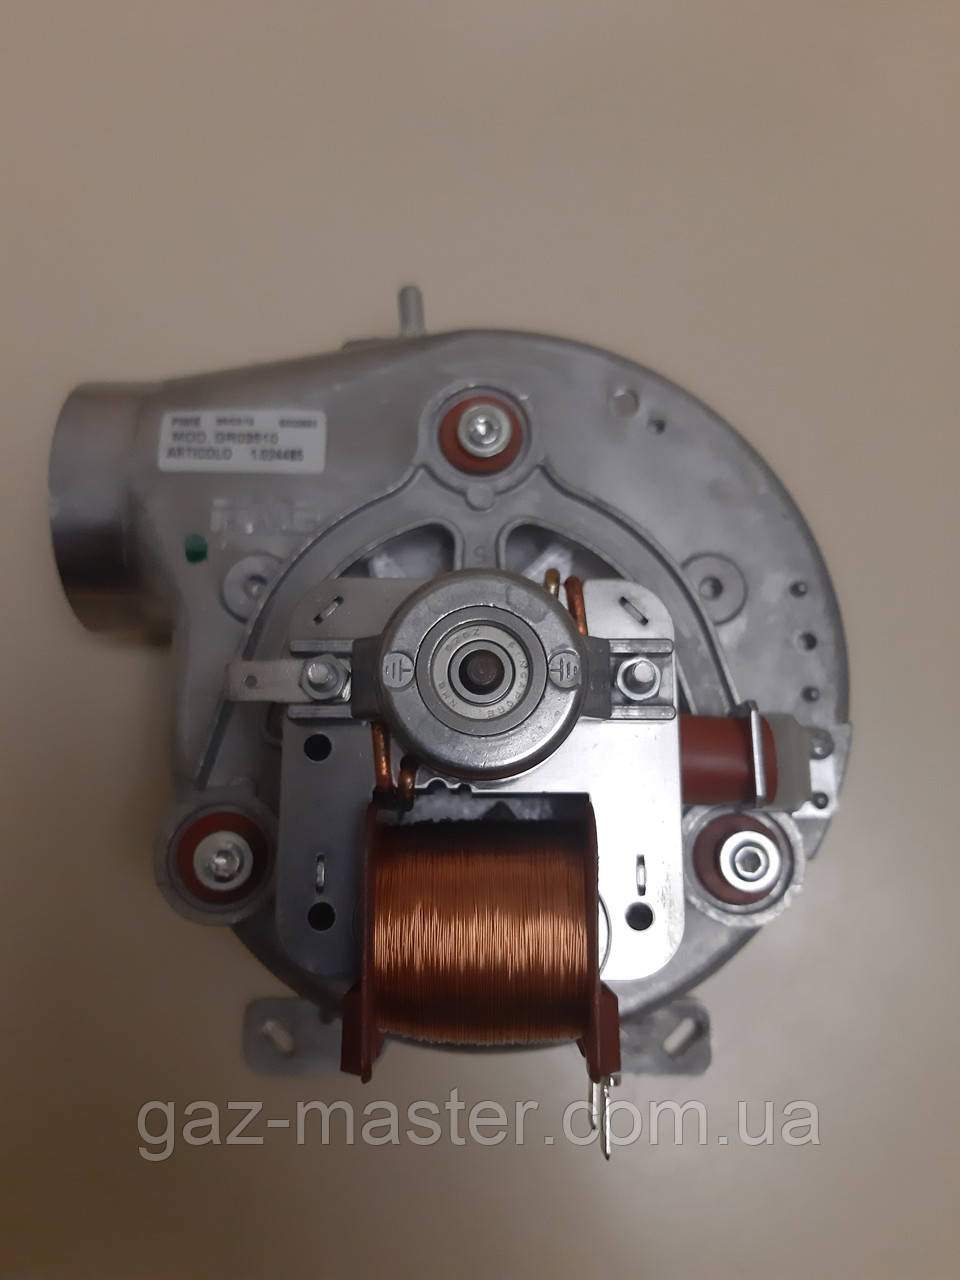 Вентилятор котла Immergas Mini 24 kw, Mini Special 24 kw 1.024485A